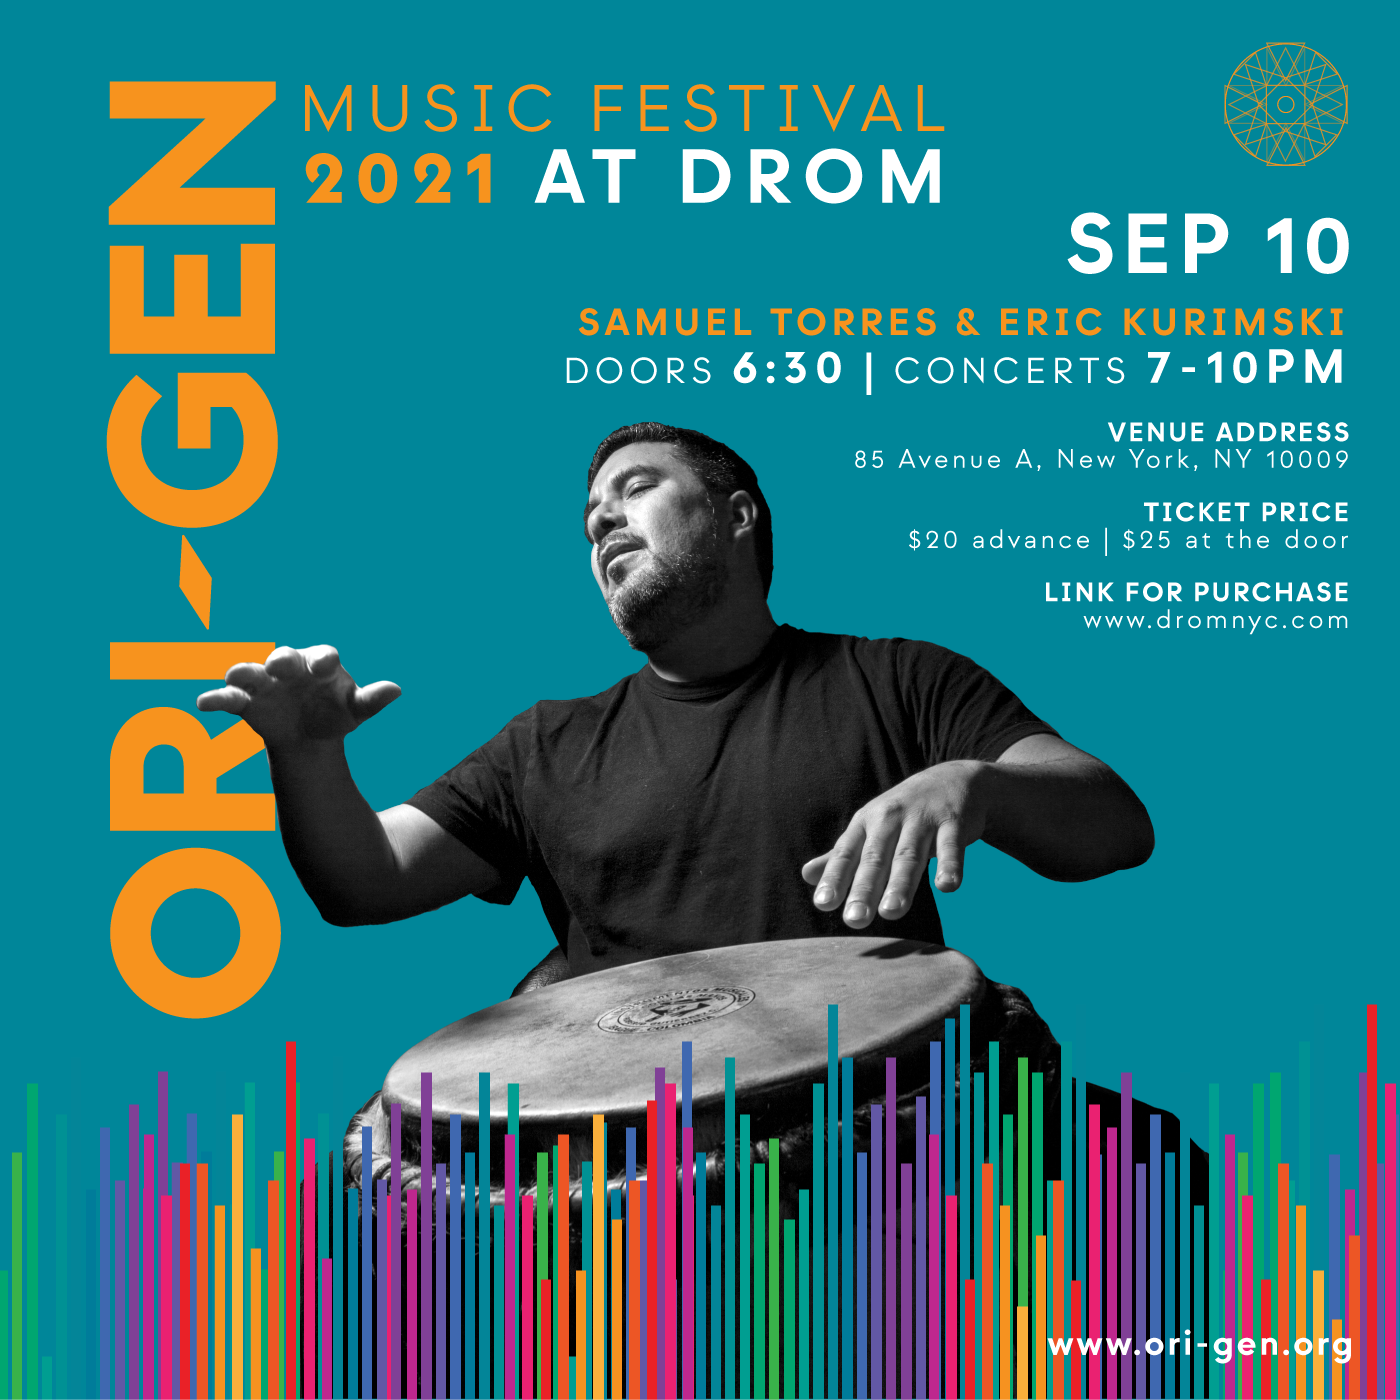 ORI-GEN-MUSICFest2021-FB-IG-SamuelTorres